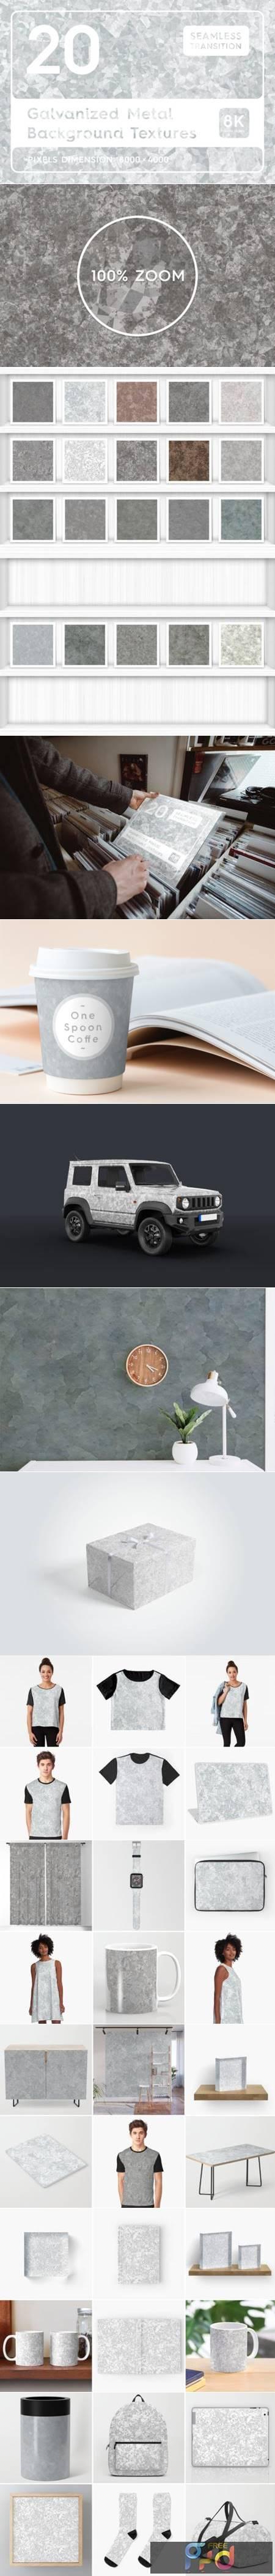 20 Galvanized Metal Background Textures 7159075 1